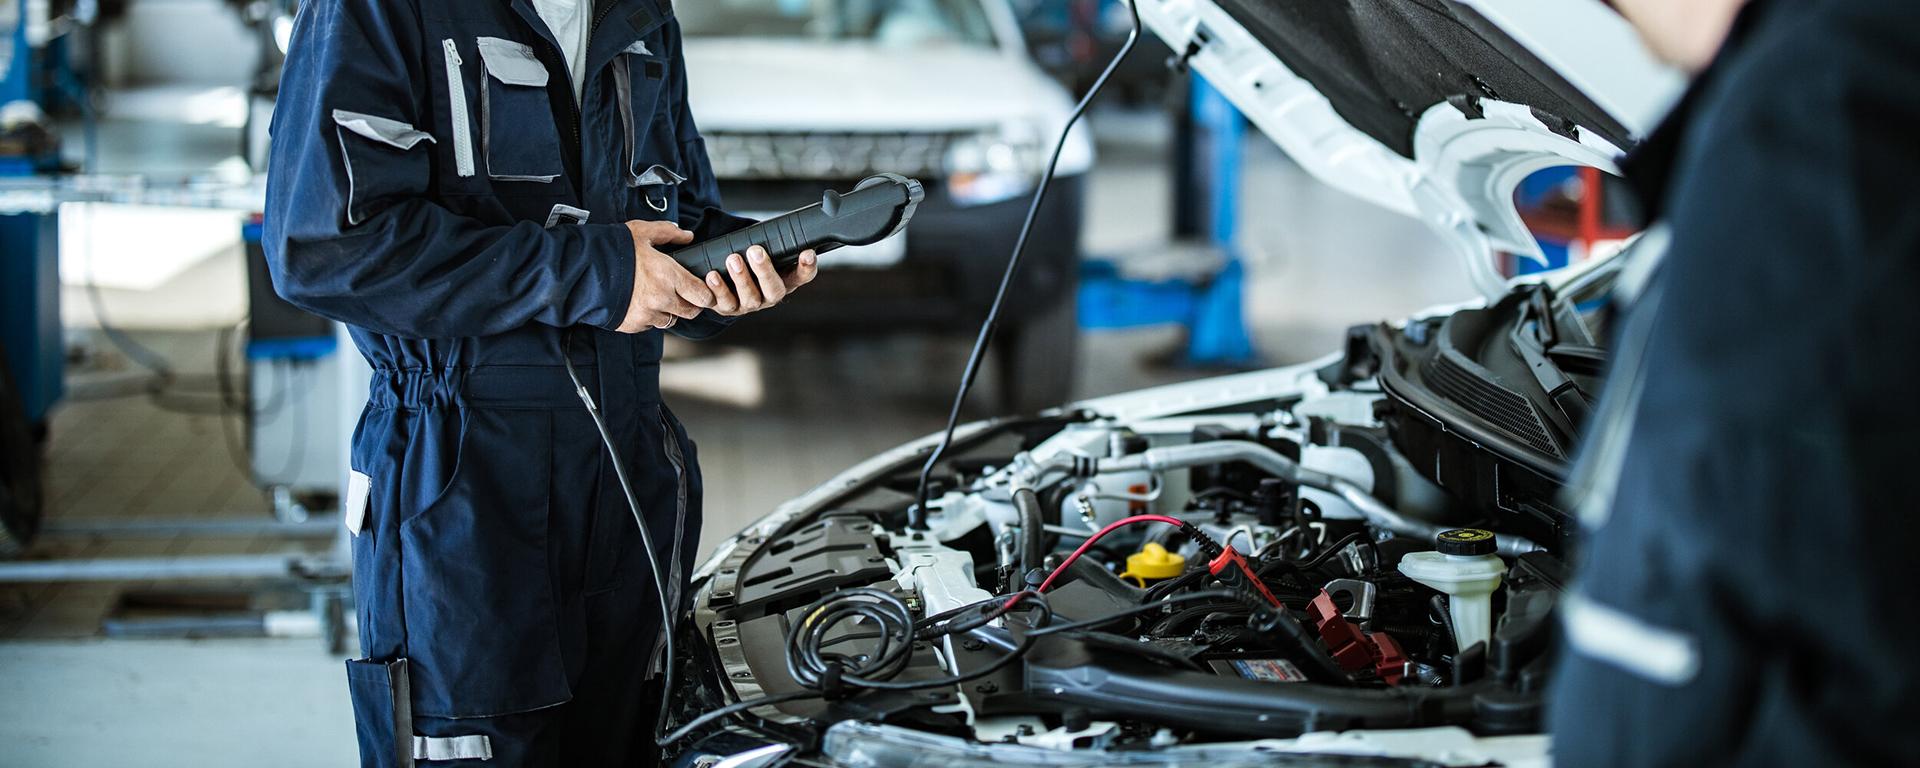 Two mechanics use a computer to diagnose car mechanical problems.